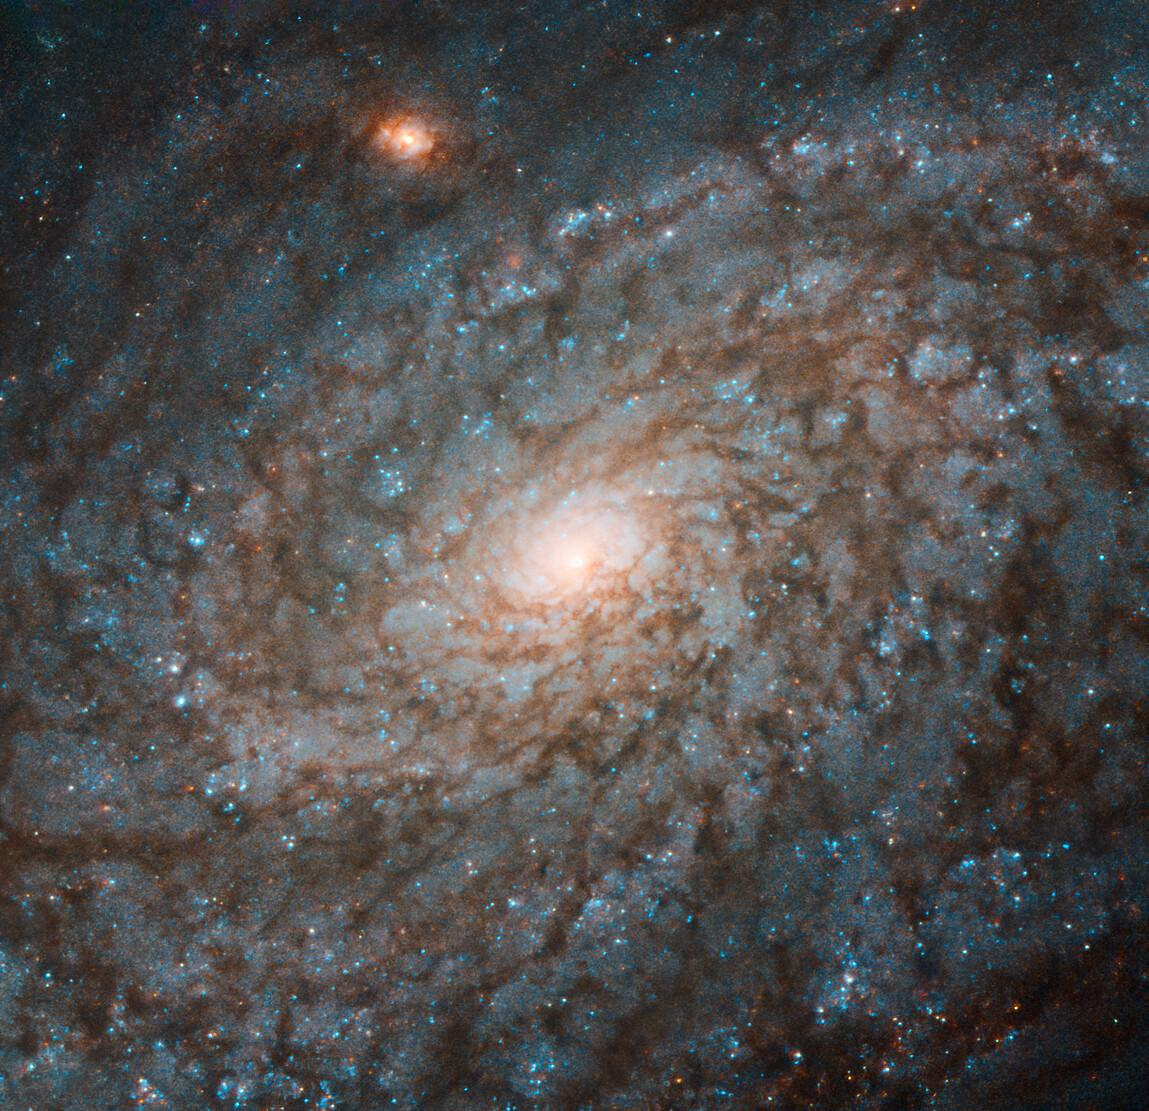 Телескоп Hubble сделал фото галактики